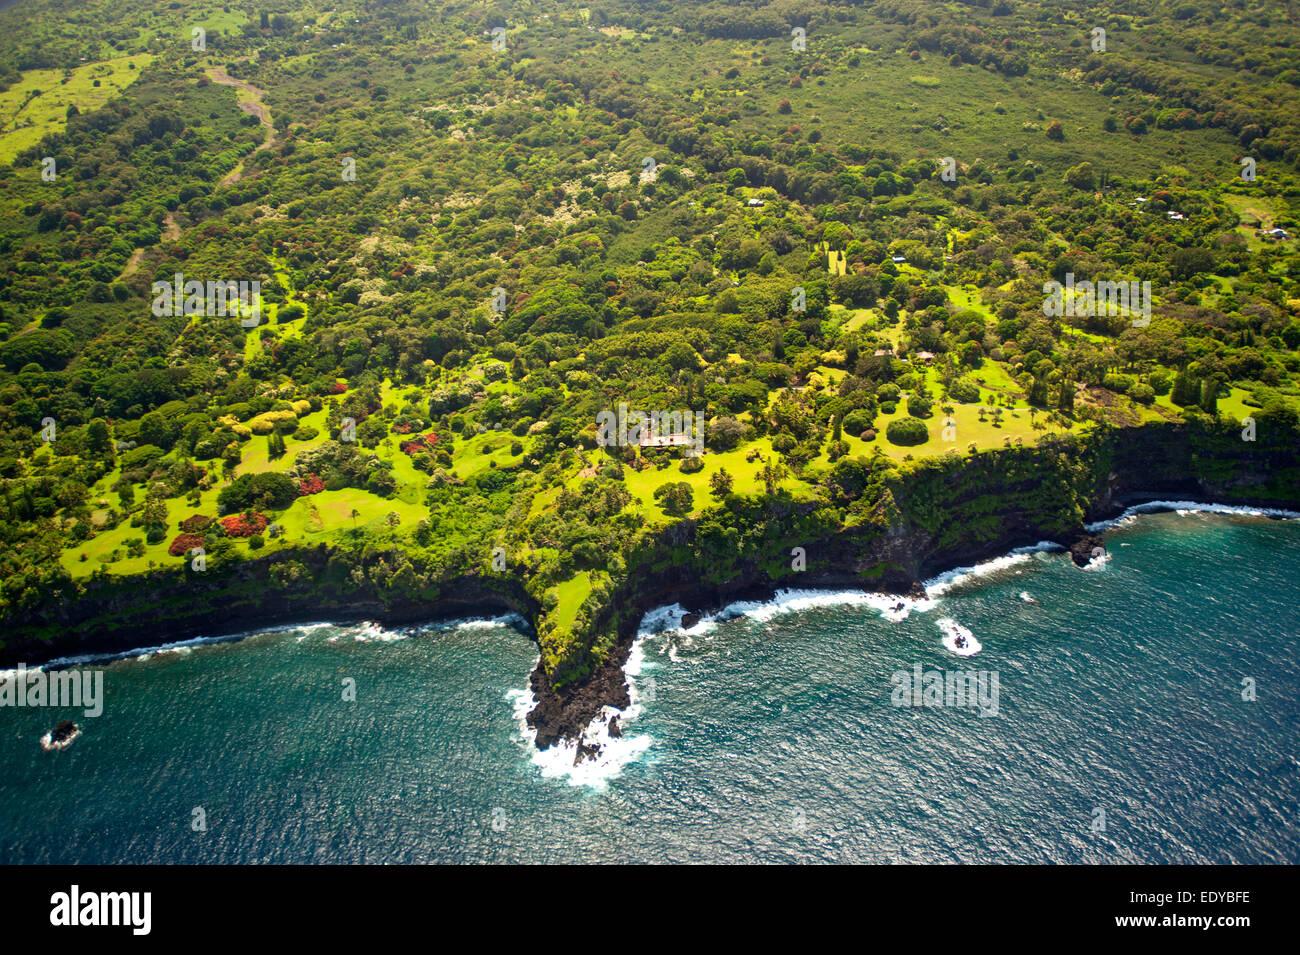 Coastline of Maui - Stock Image